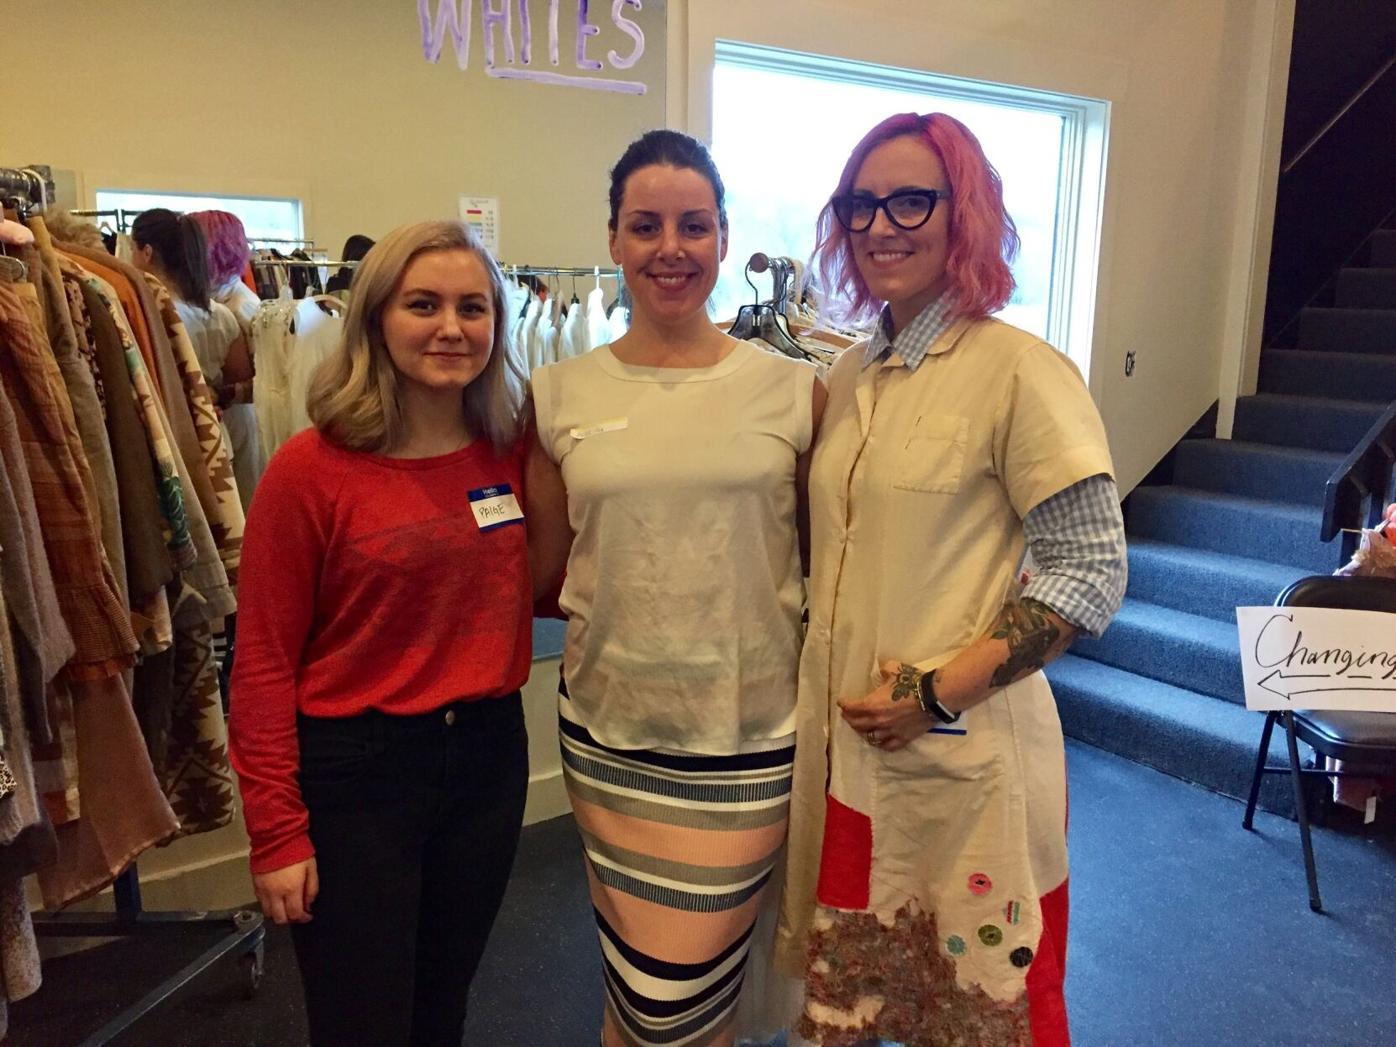 The Scene: Fashion lovers flock to BerkChique